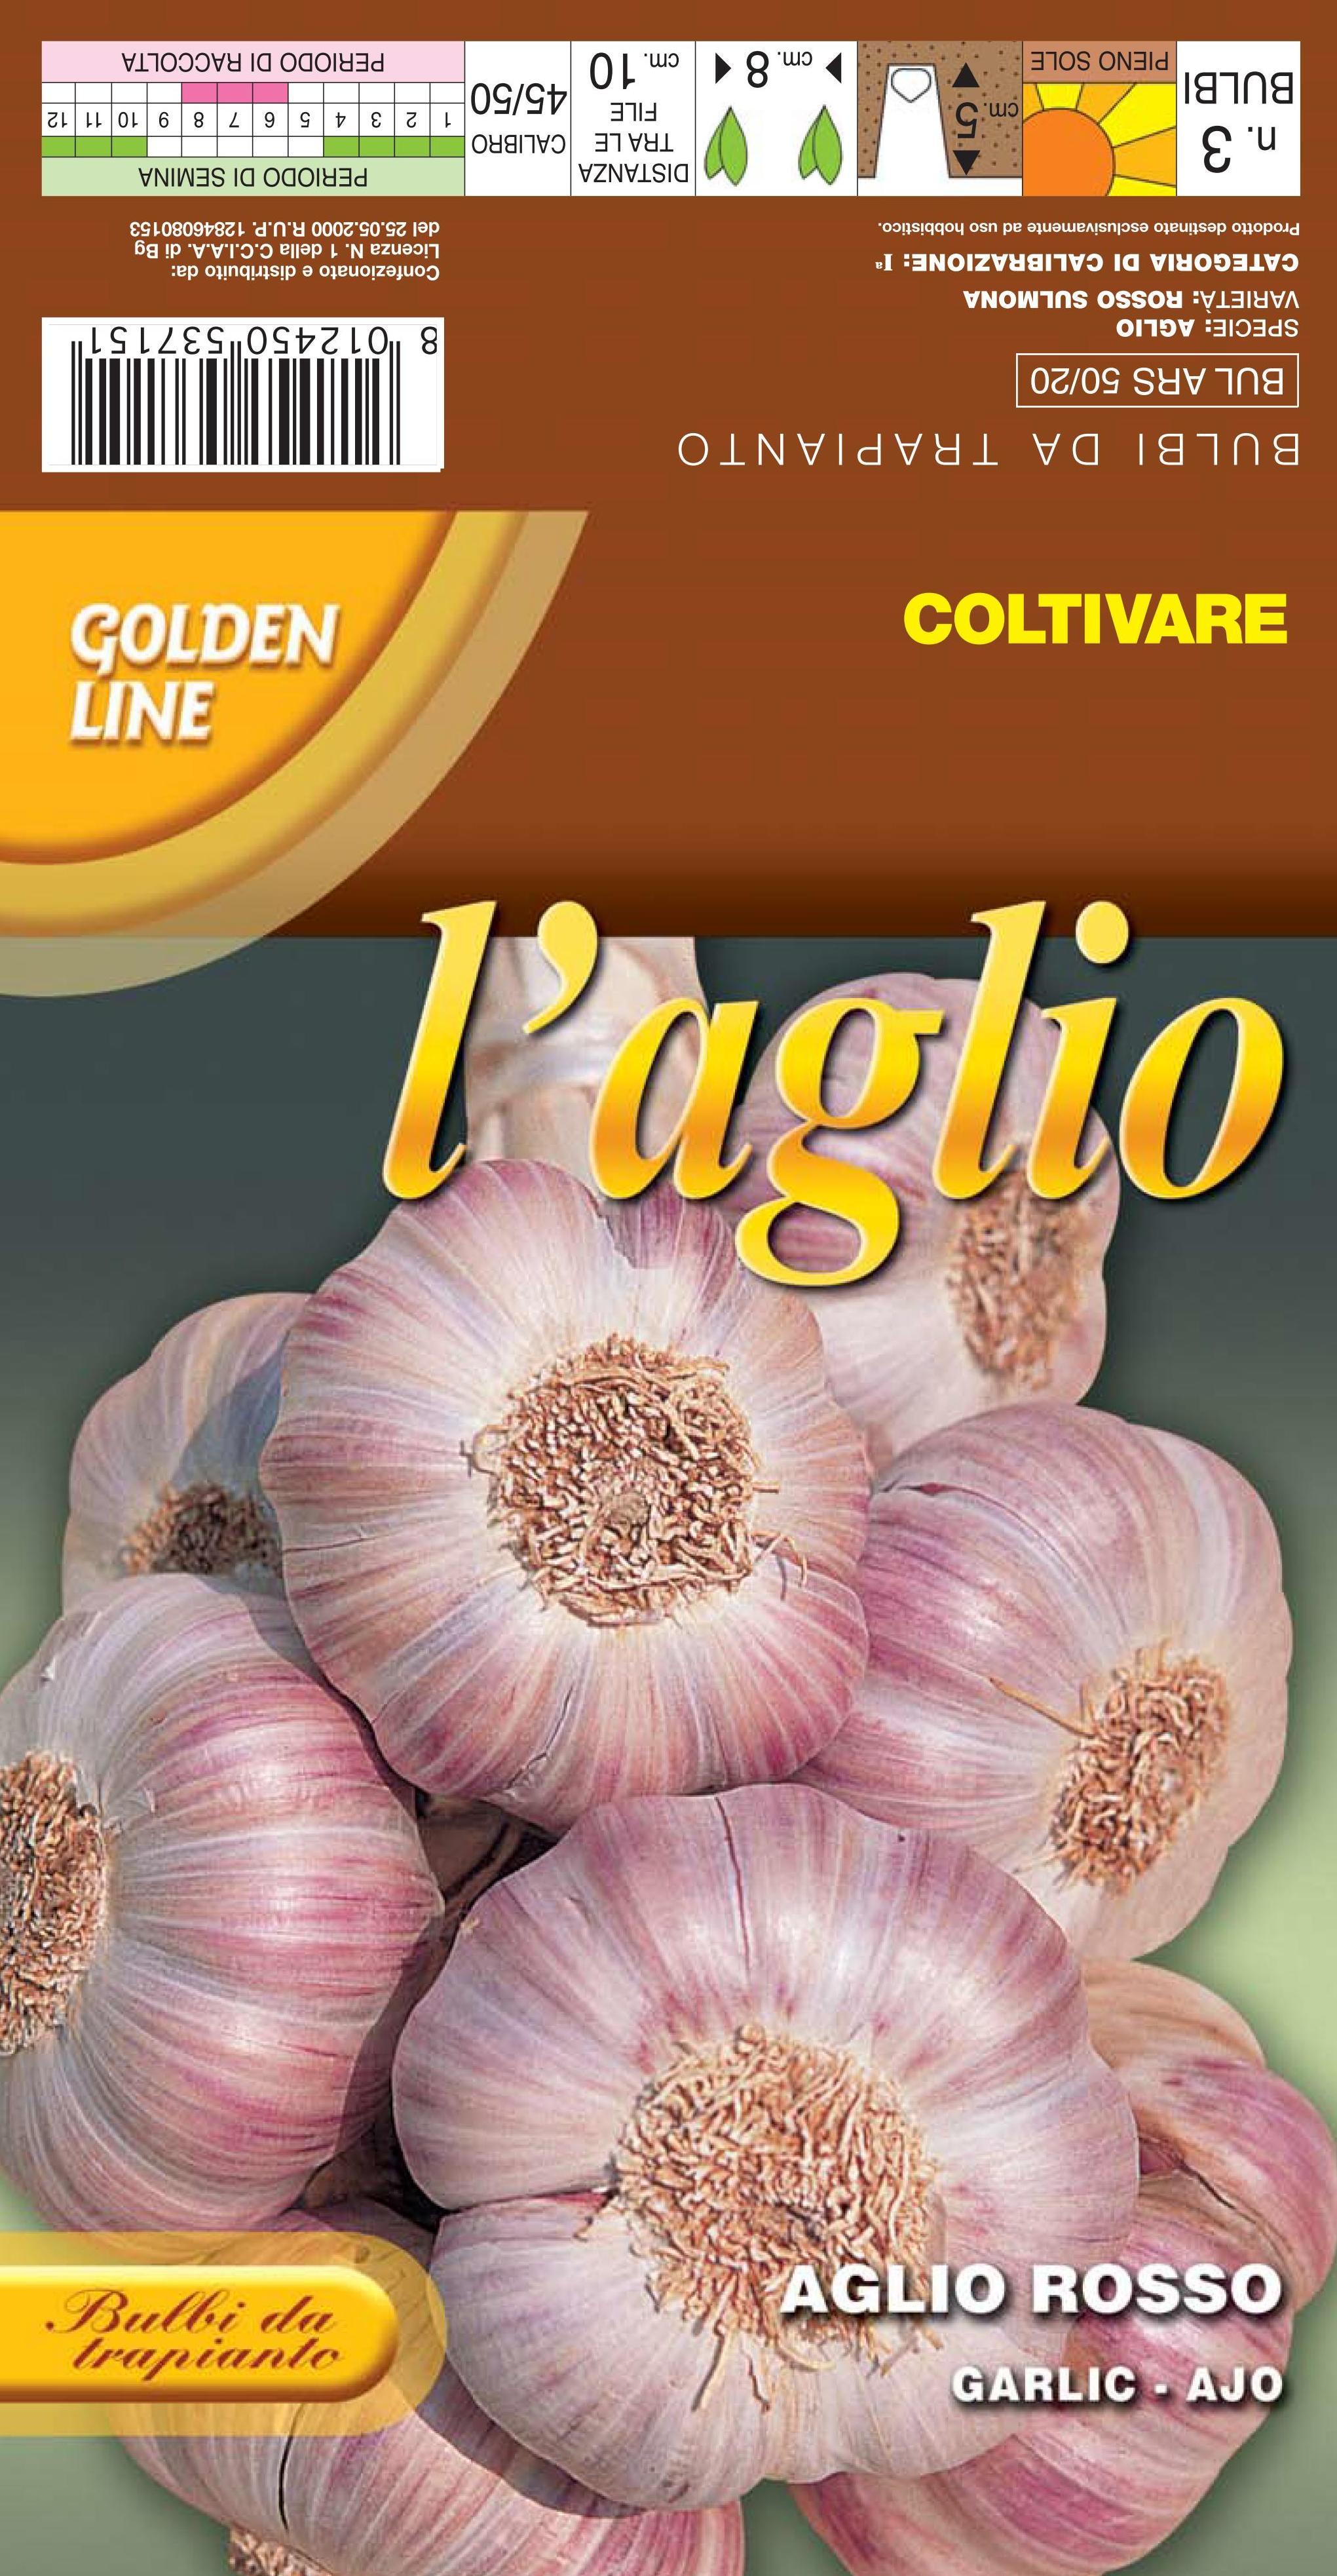 Italian Garlic rossa di Sulmona  (A) Allium Sativum L. PRE ORDER FOR AUTUMN